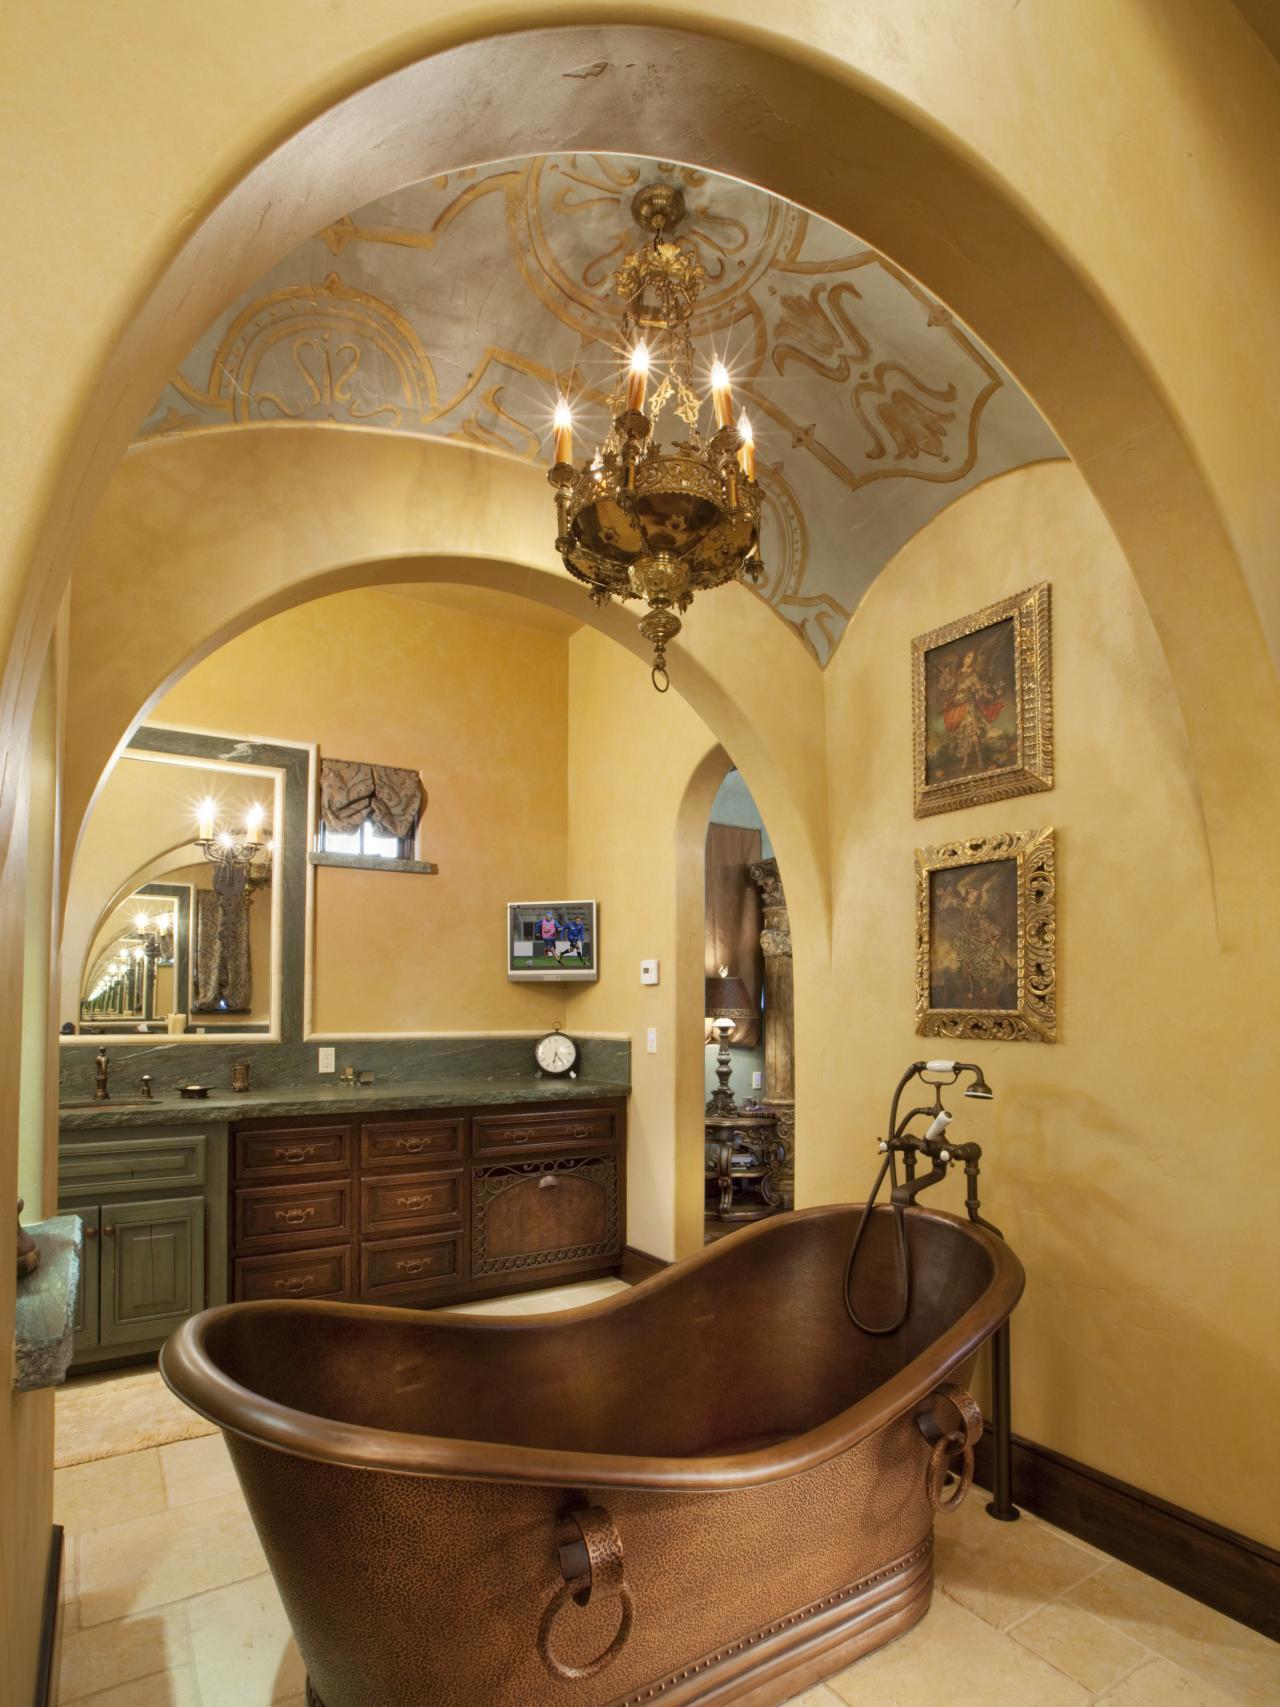 25 Mediterranean Bathroom Design Ideas - Decoration Love